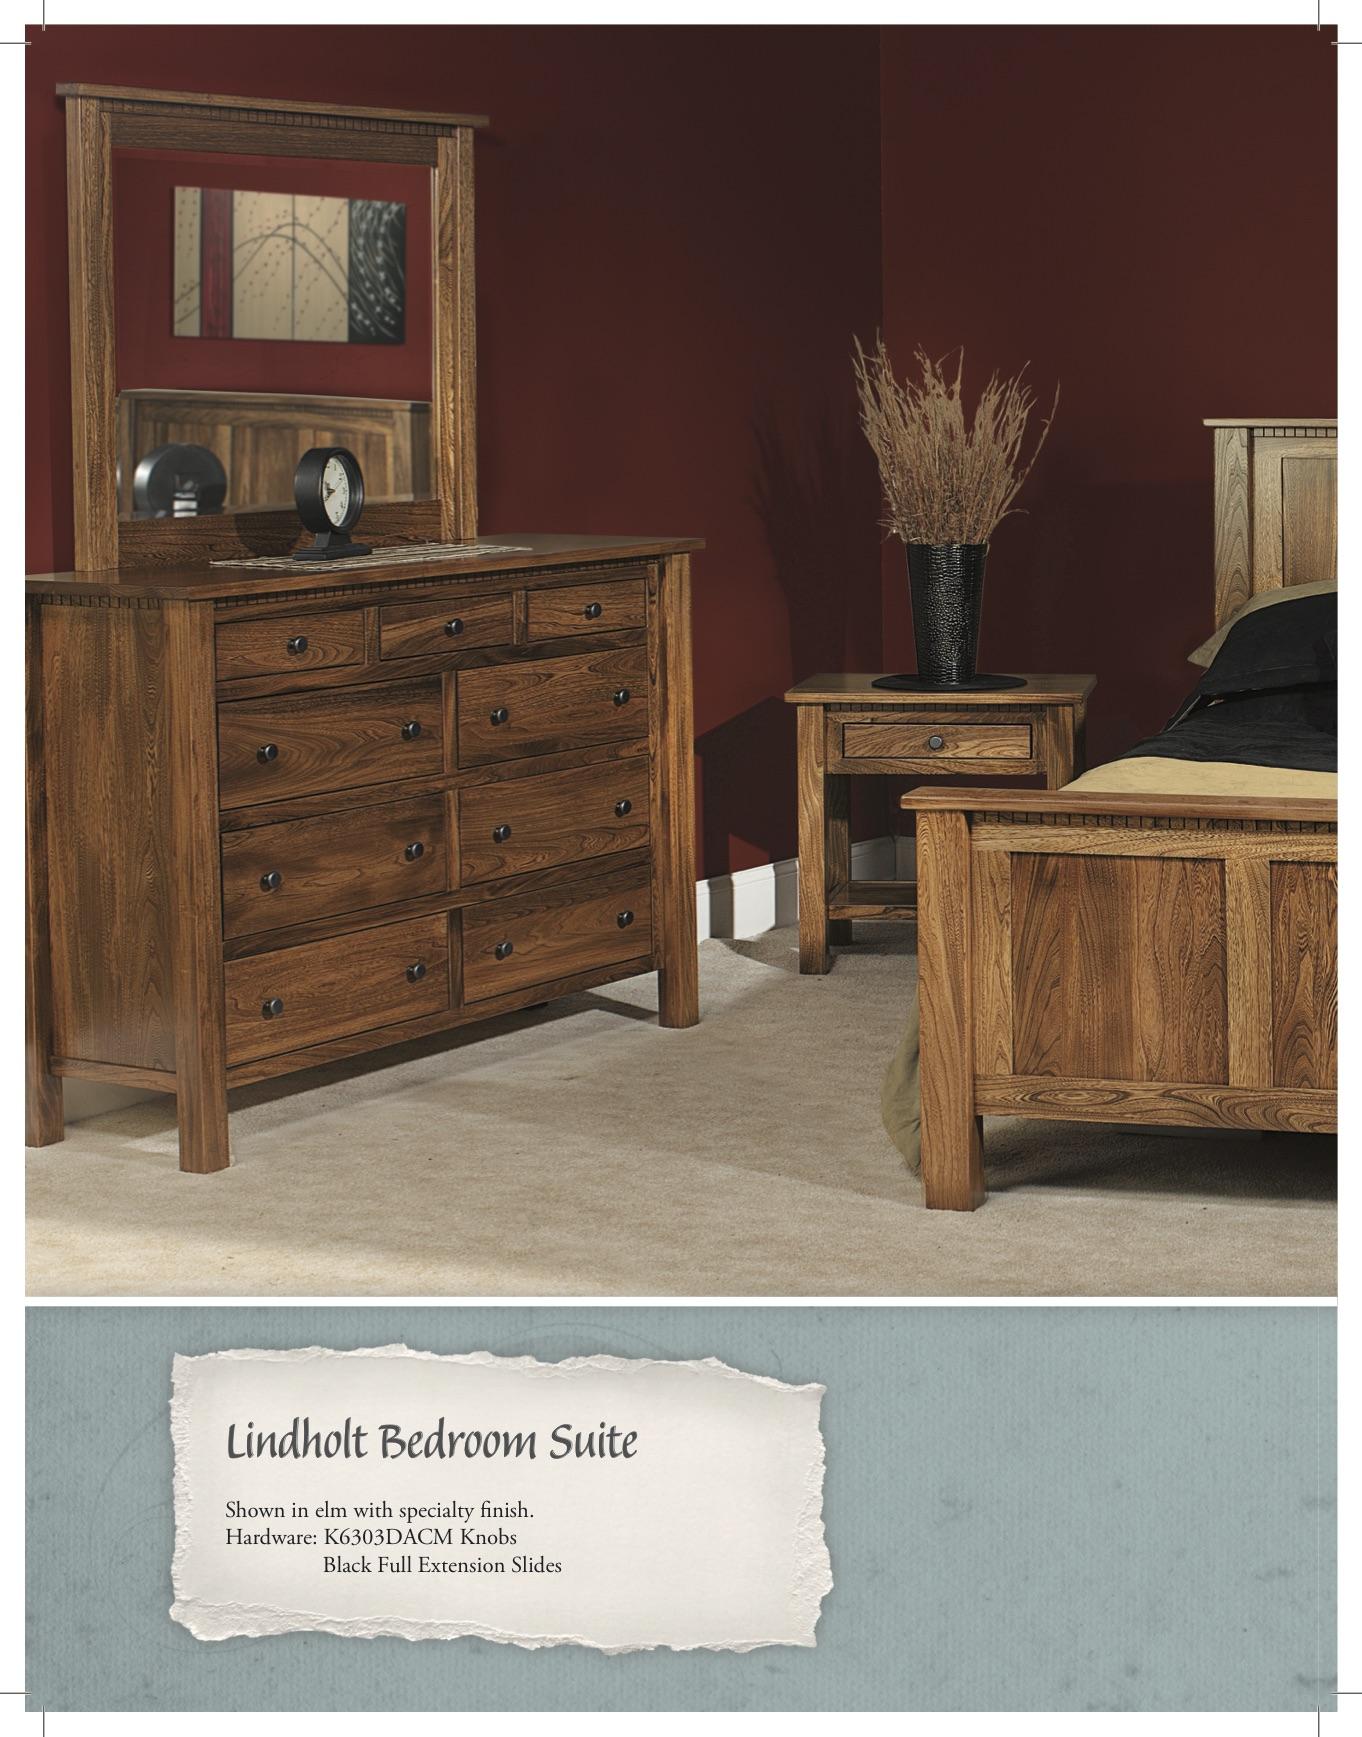 Mercer PA Furniture Dealers